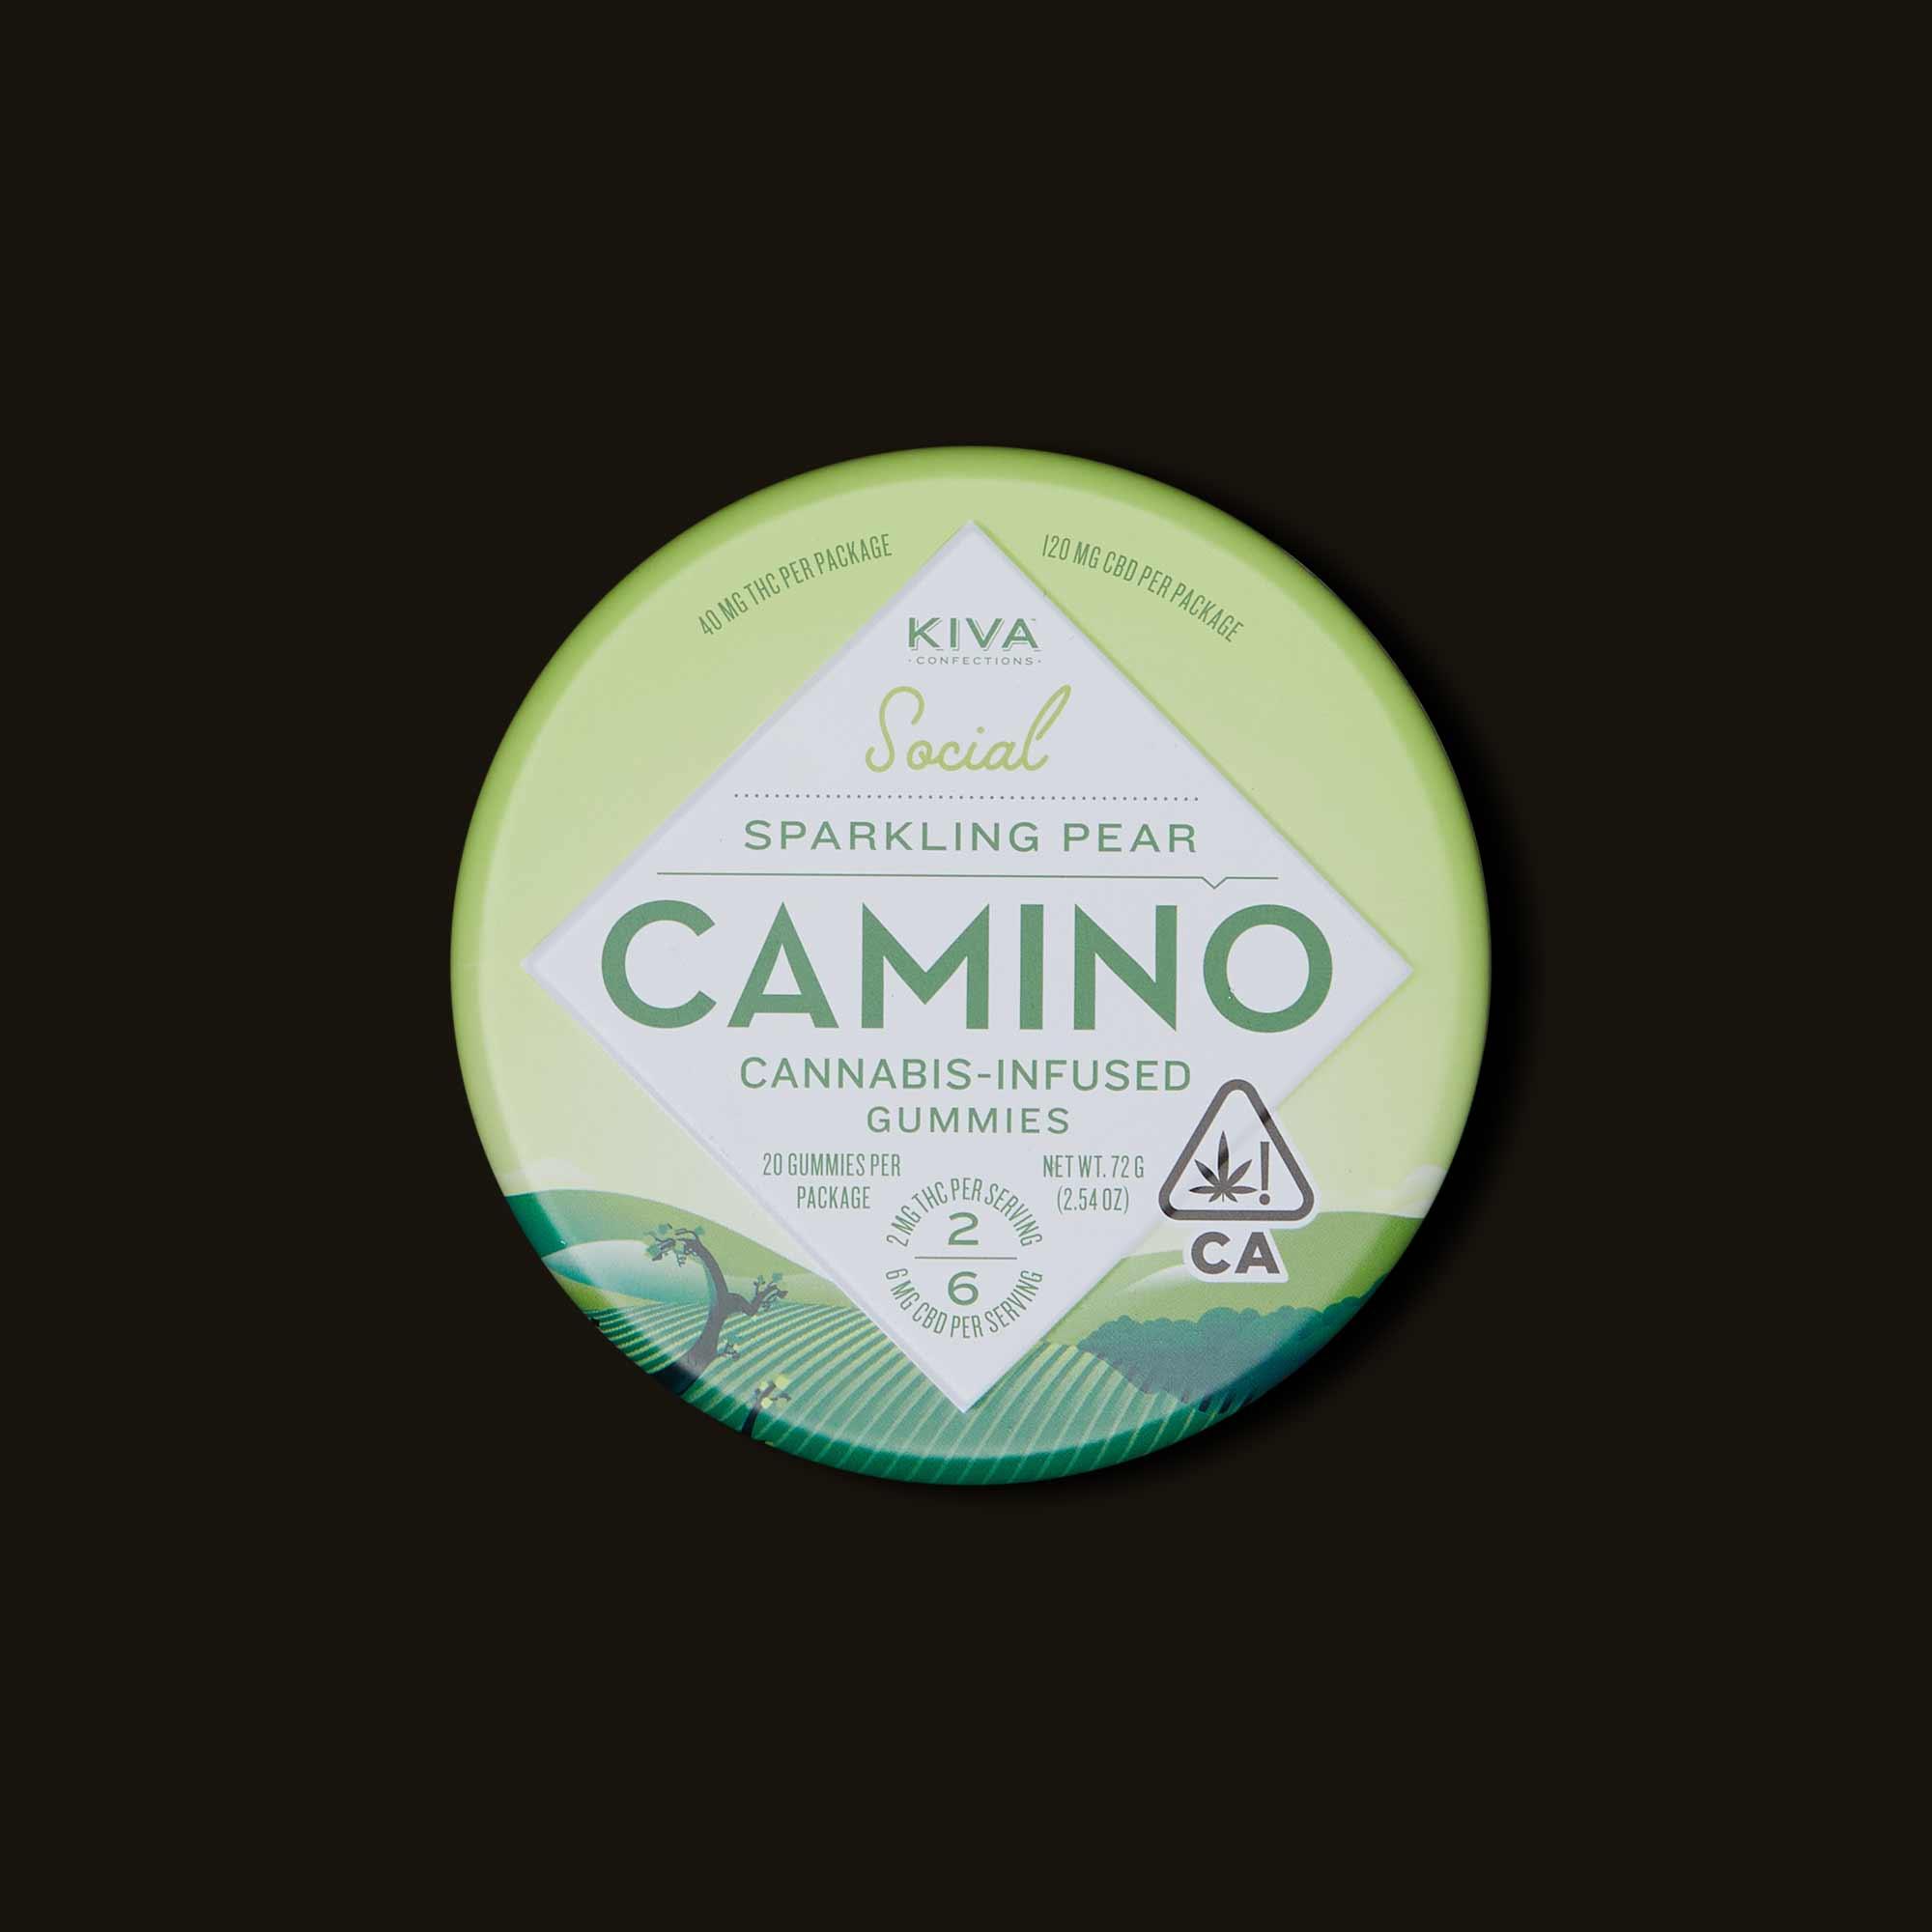 Camino Sparkling Pear Gummies - 20 gummies (40mg thc, 120mg CBD)